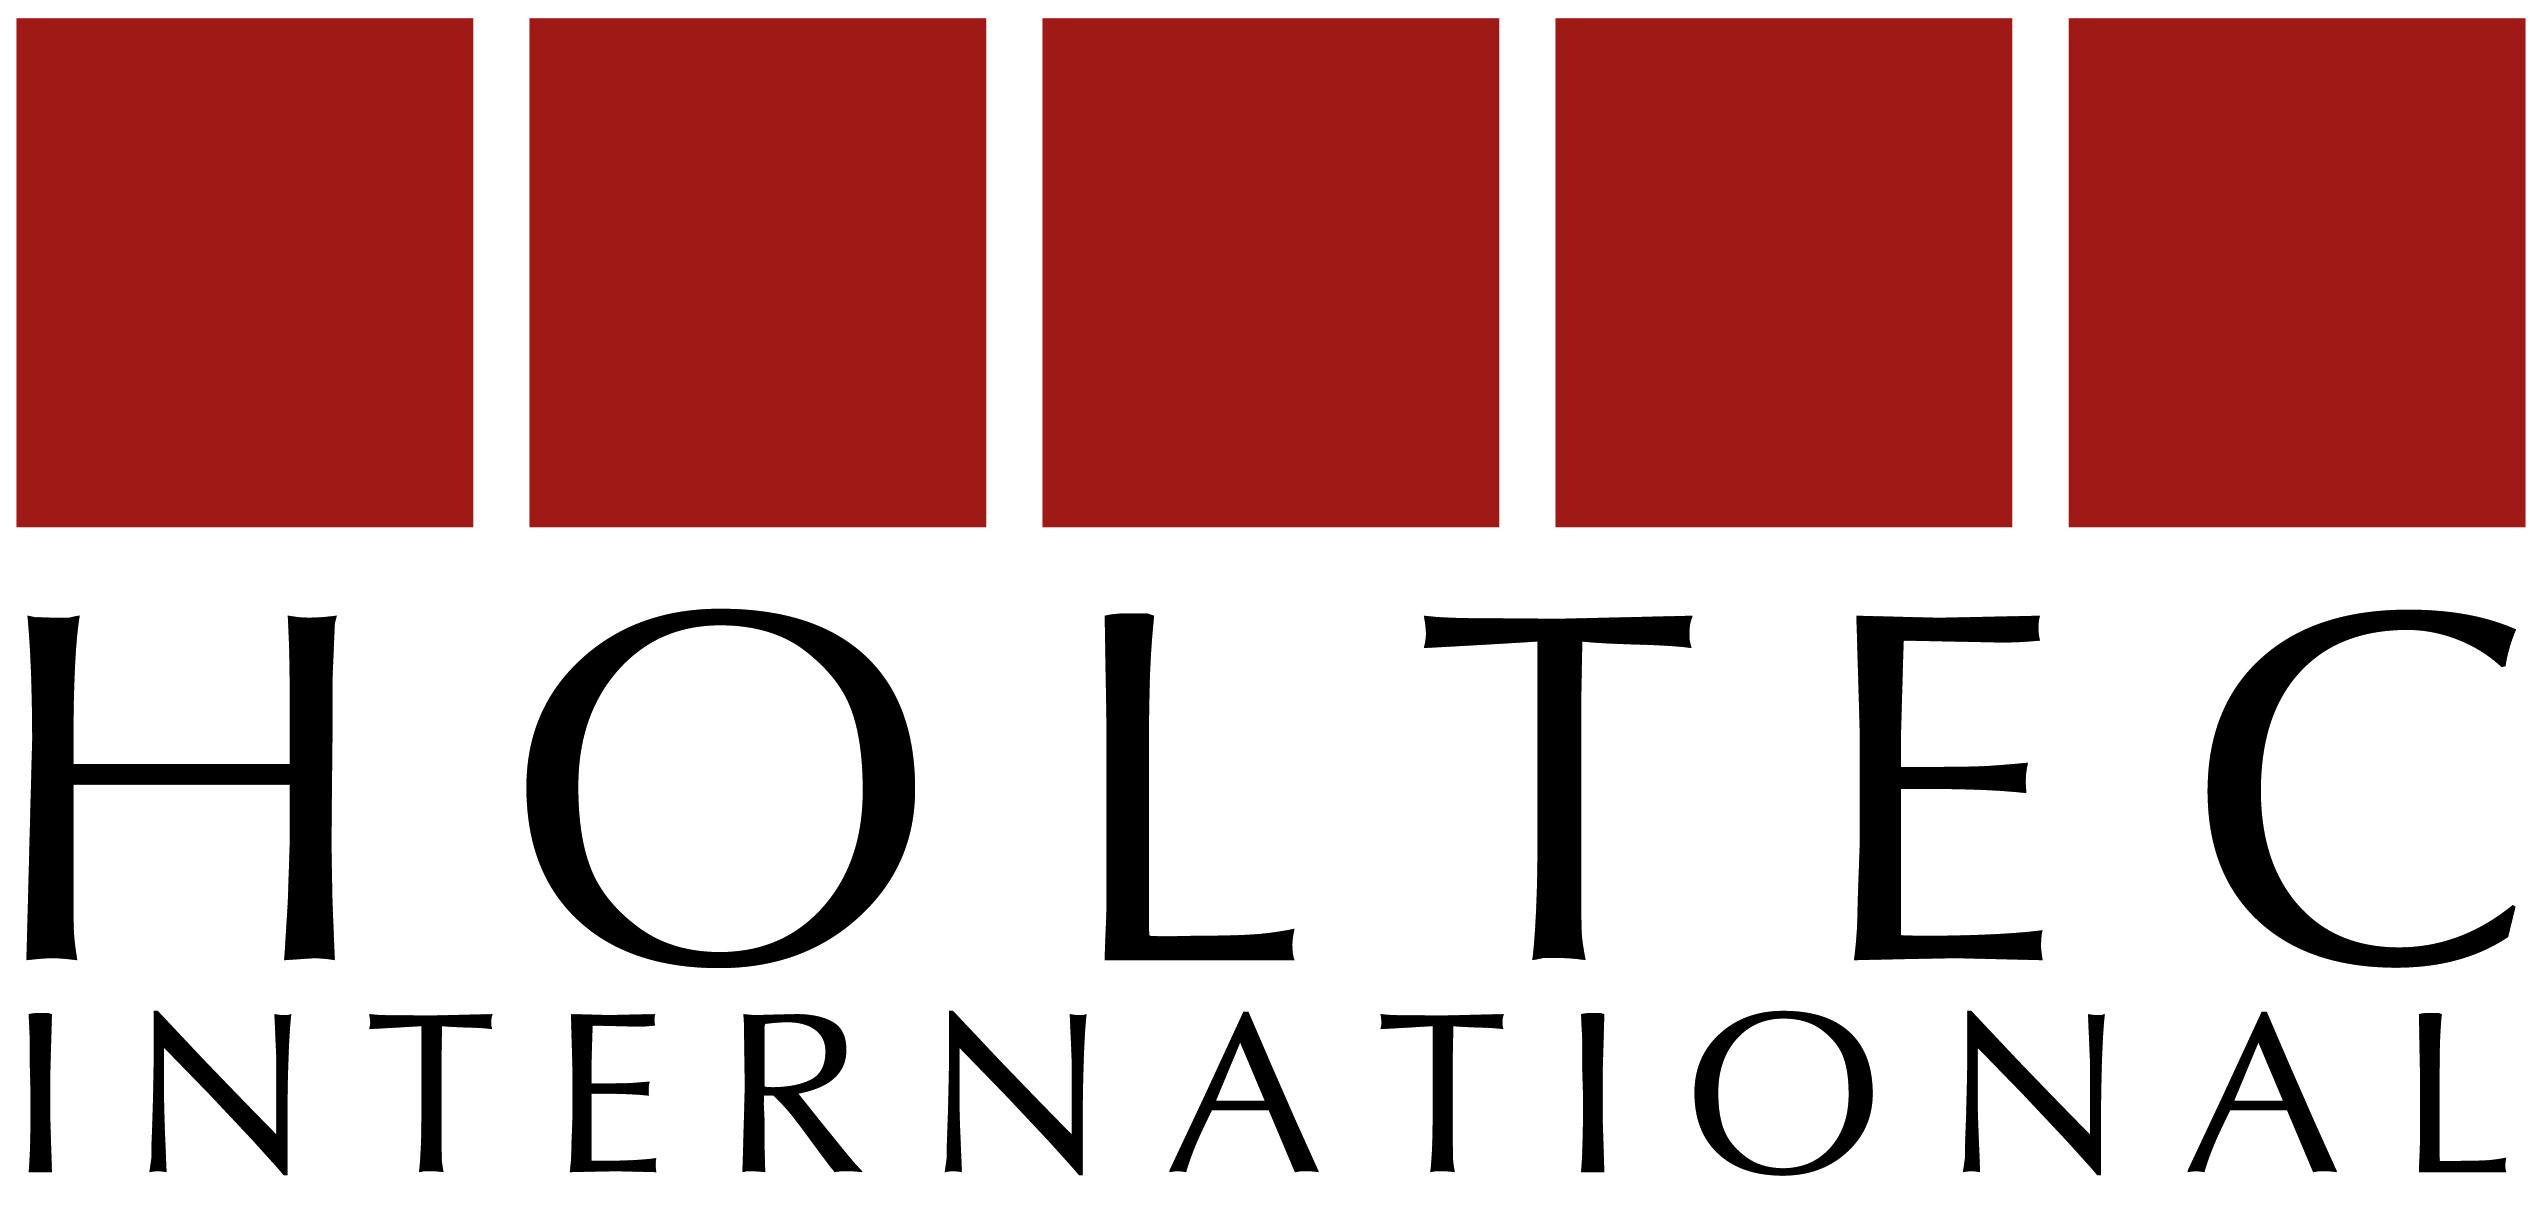 Mastercam CNC Programmer - Holtec International - Career Page